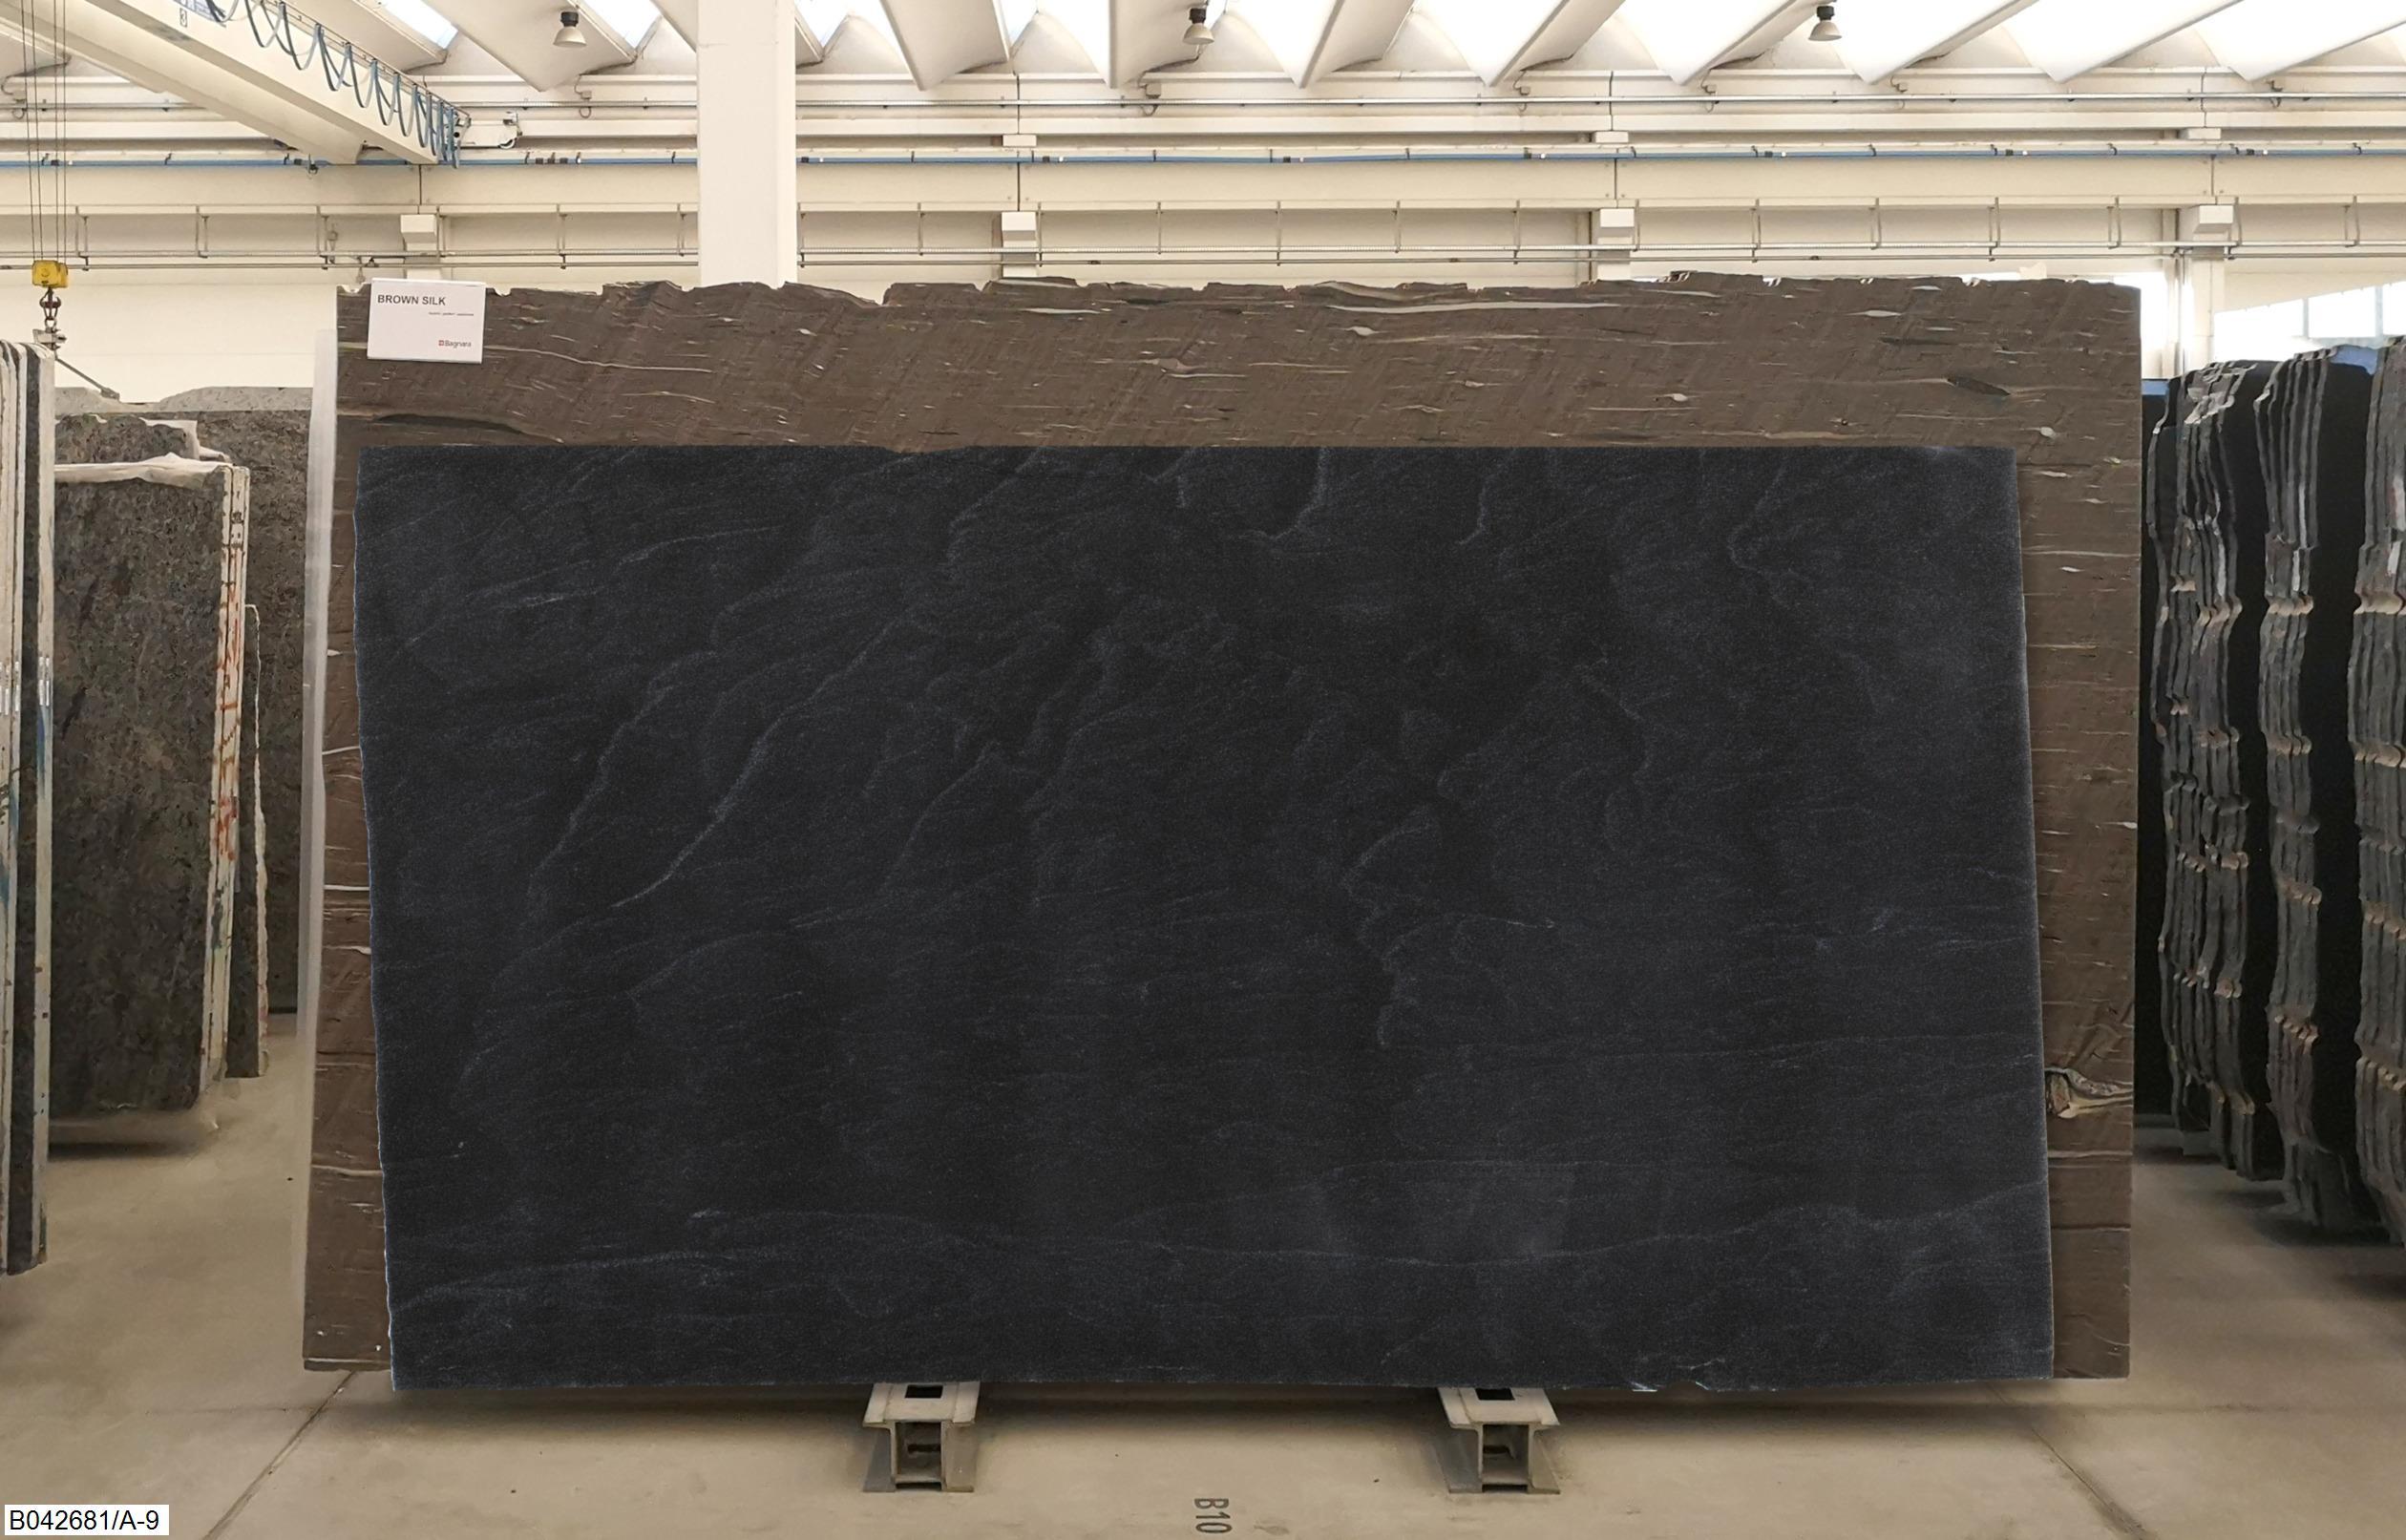 AMERICAN BLACK FANTASTIC - LASTRE LUCIDE Foto: 1_59679_39222.jpg